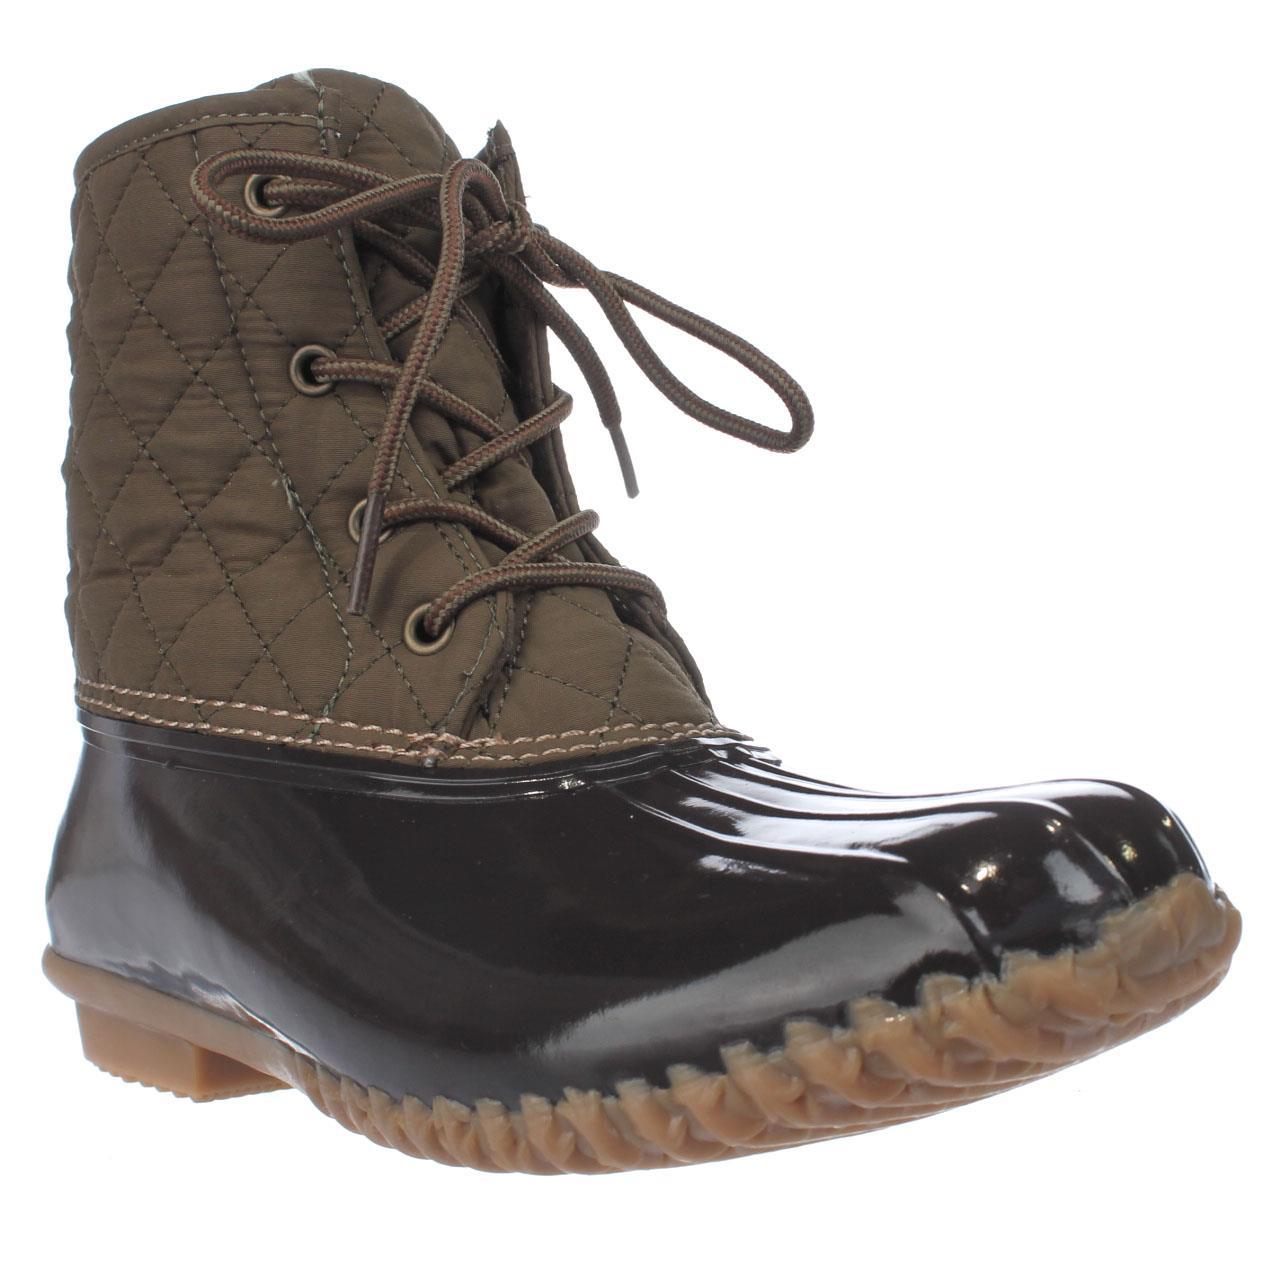 Womens JBU by Jambu Stefani Mid-Calf Rain Boots, Army Green Brown by Jambu